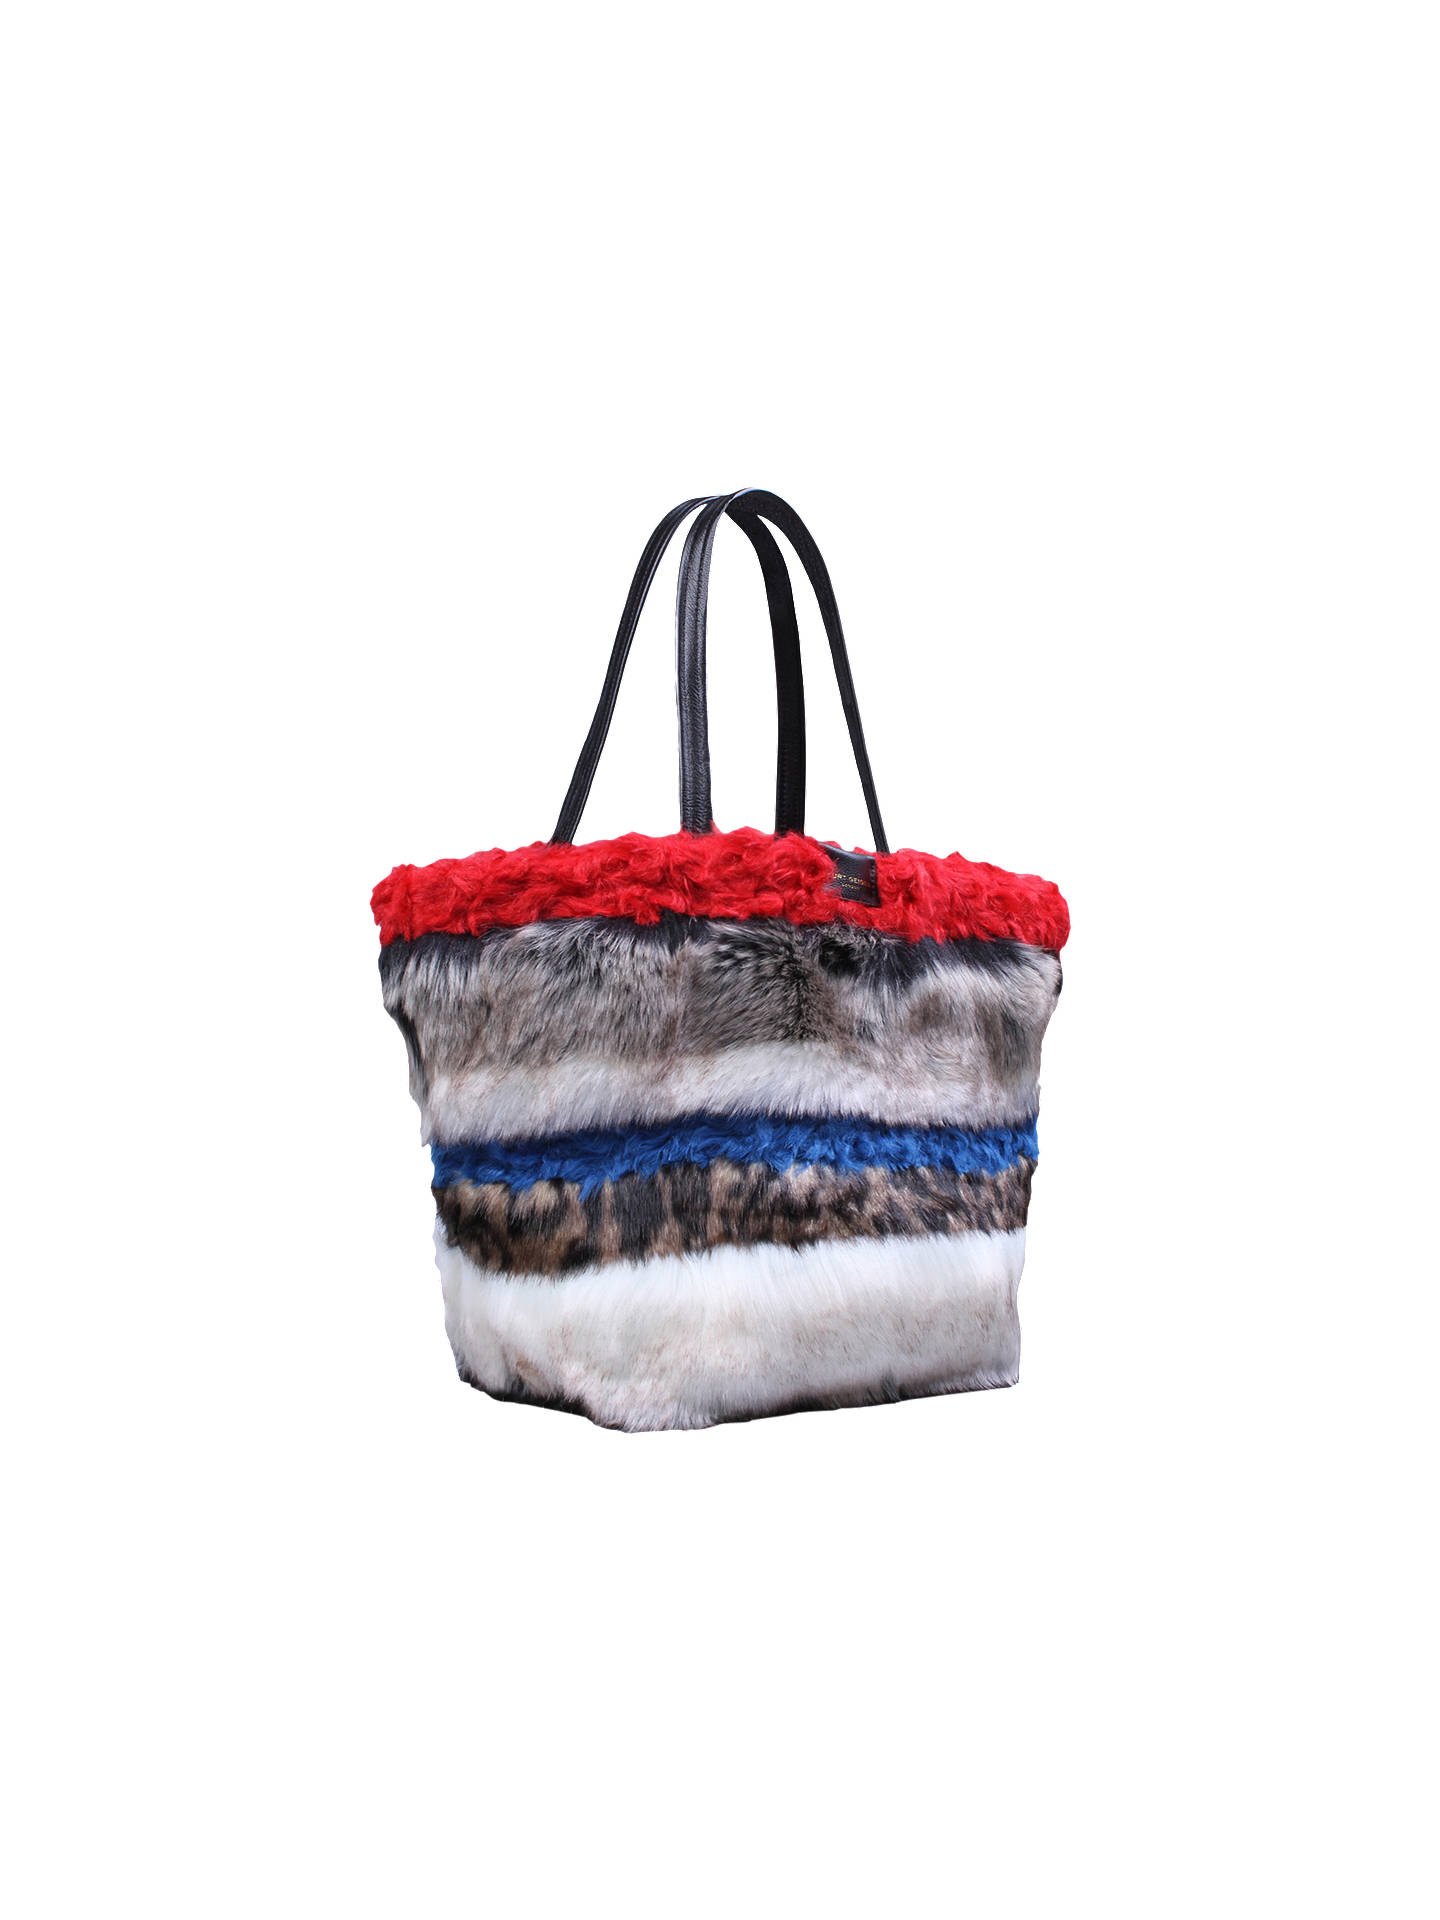 1d2218f09c ... Buy Kurt Geiger Poppy Soft Tote Bag